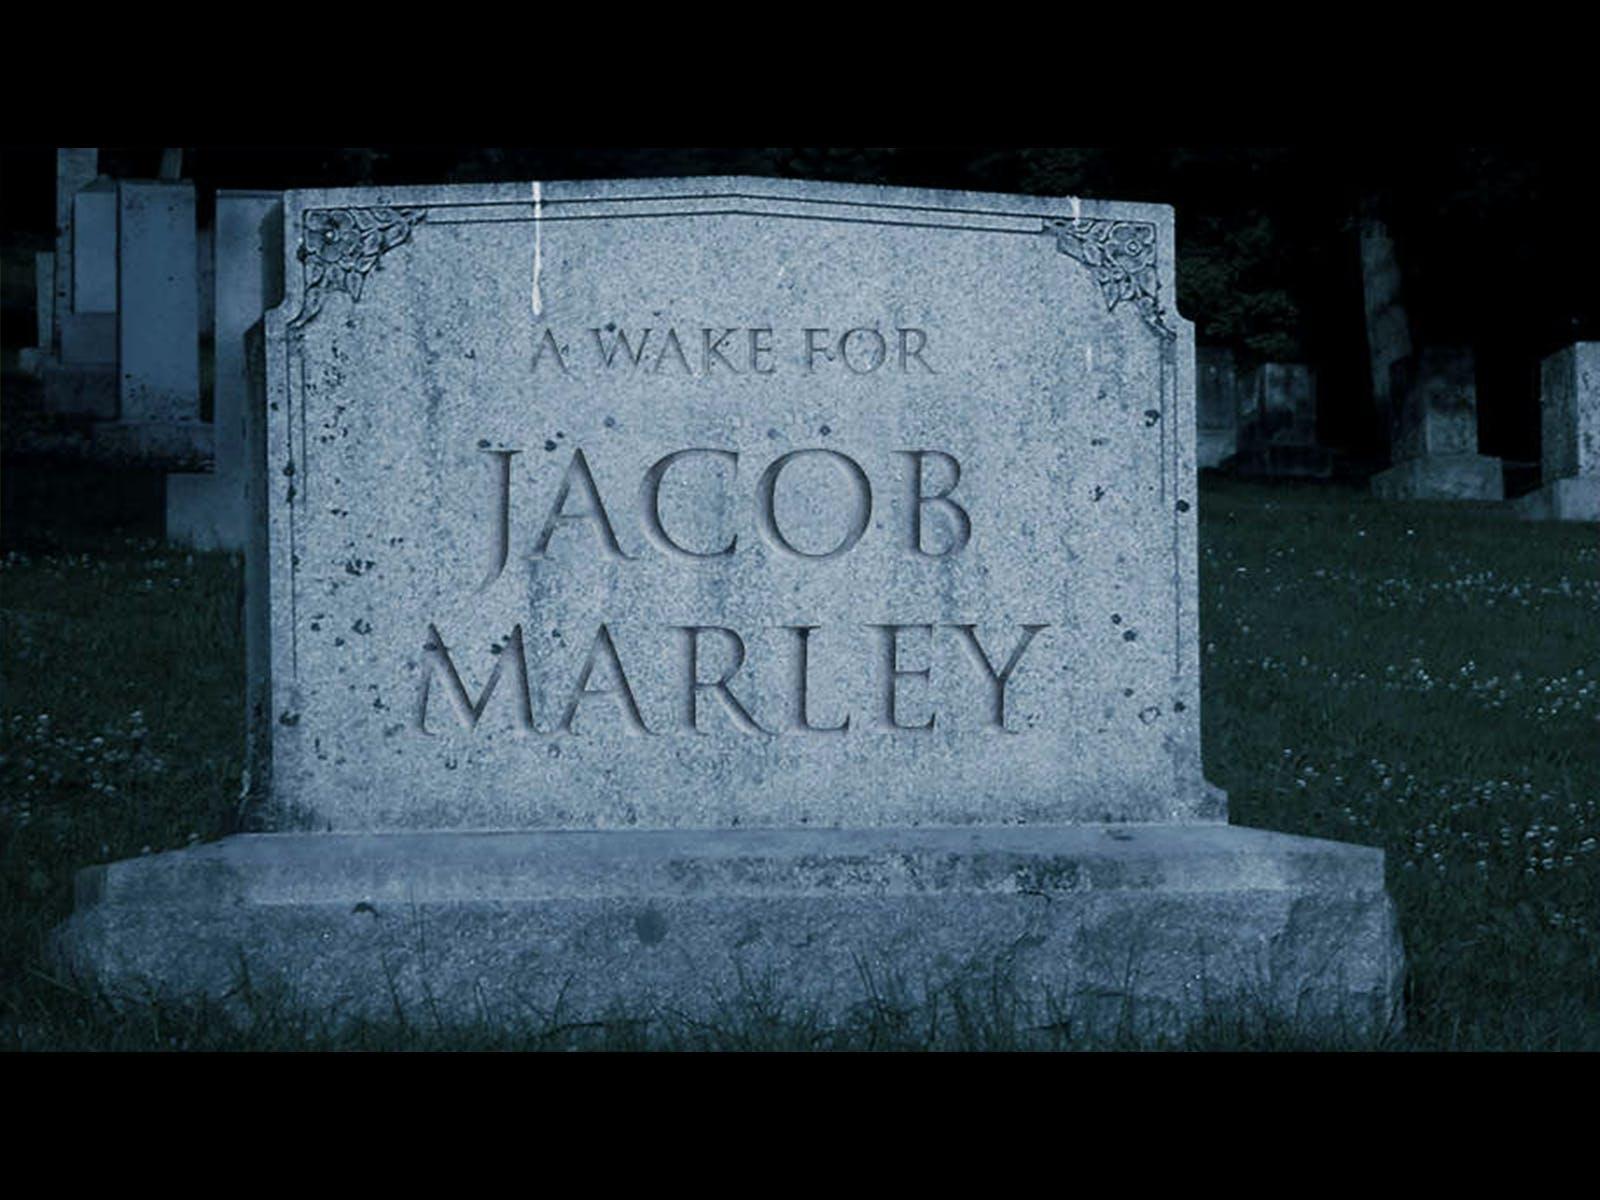 A Wake For Jacob Marley Tickets Washington DC TodayTix